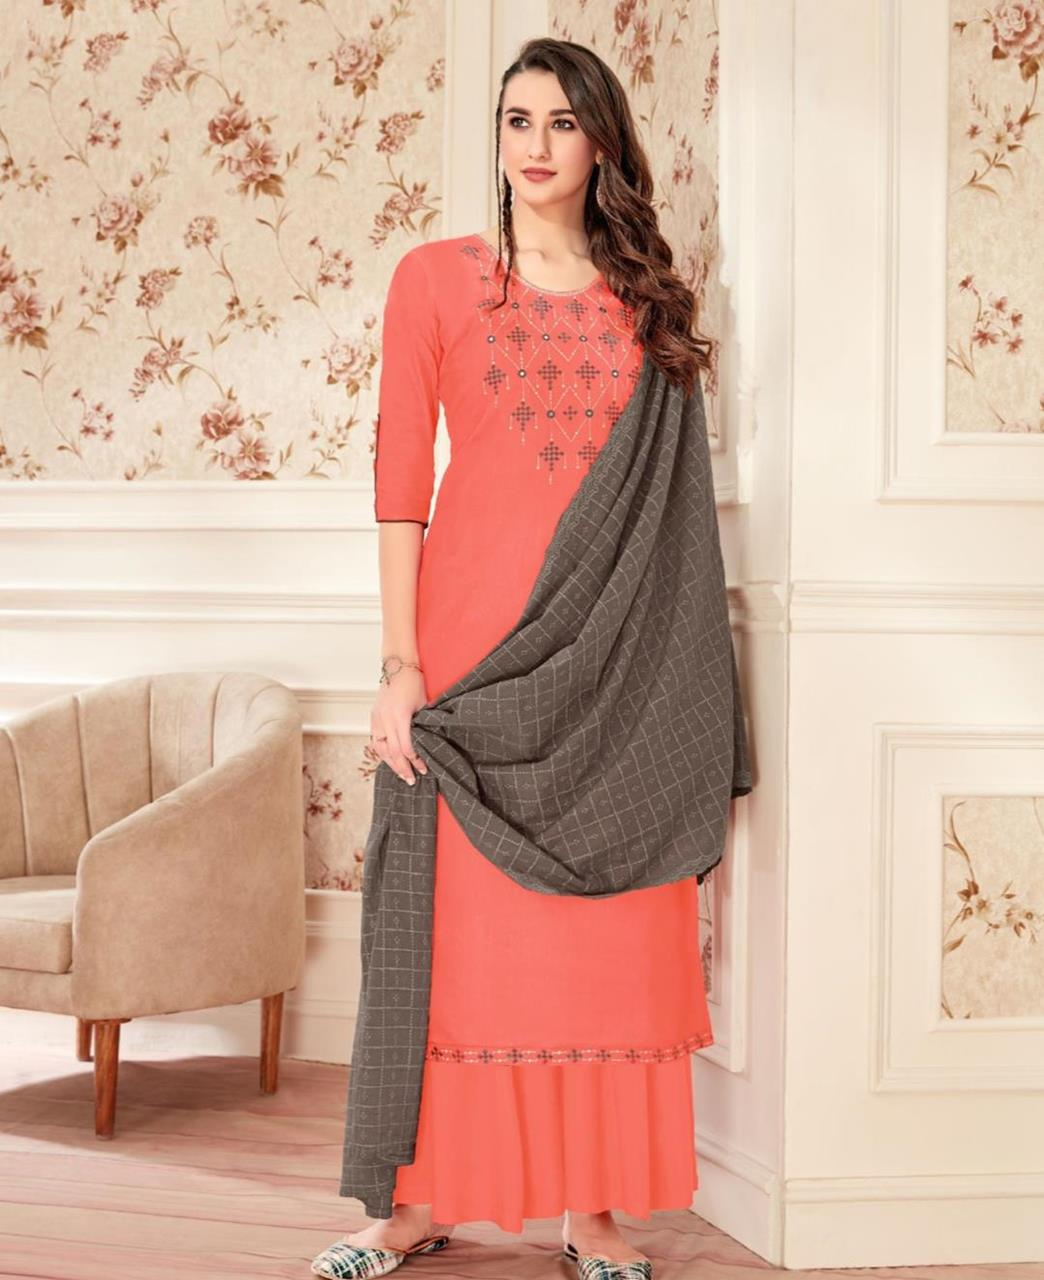 Zari Cotton Straight cut Salwar Kameez in Pink